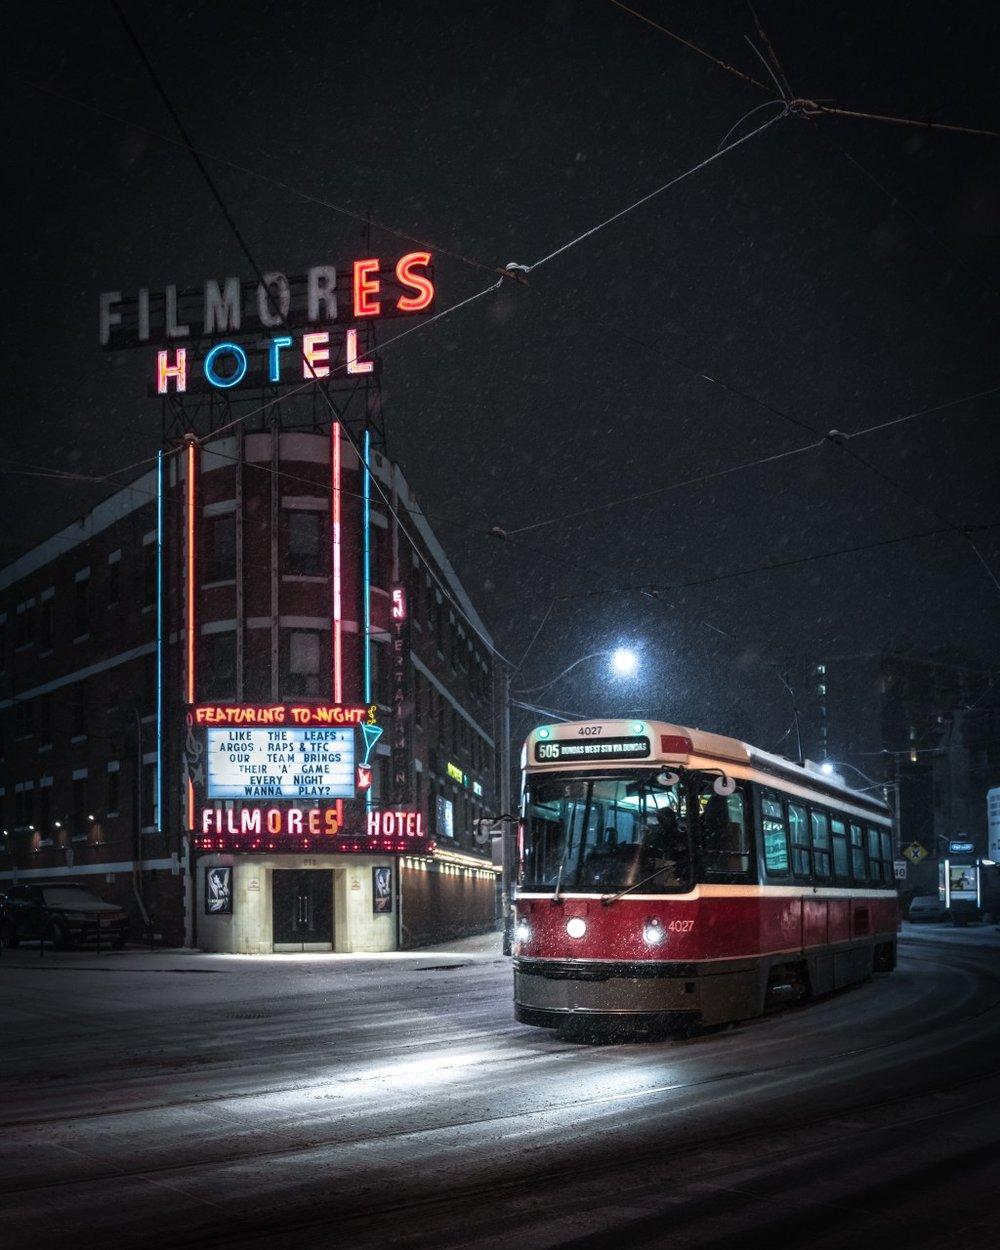 Filmores Hotel Toronto